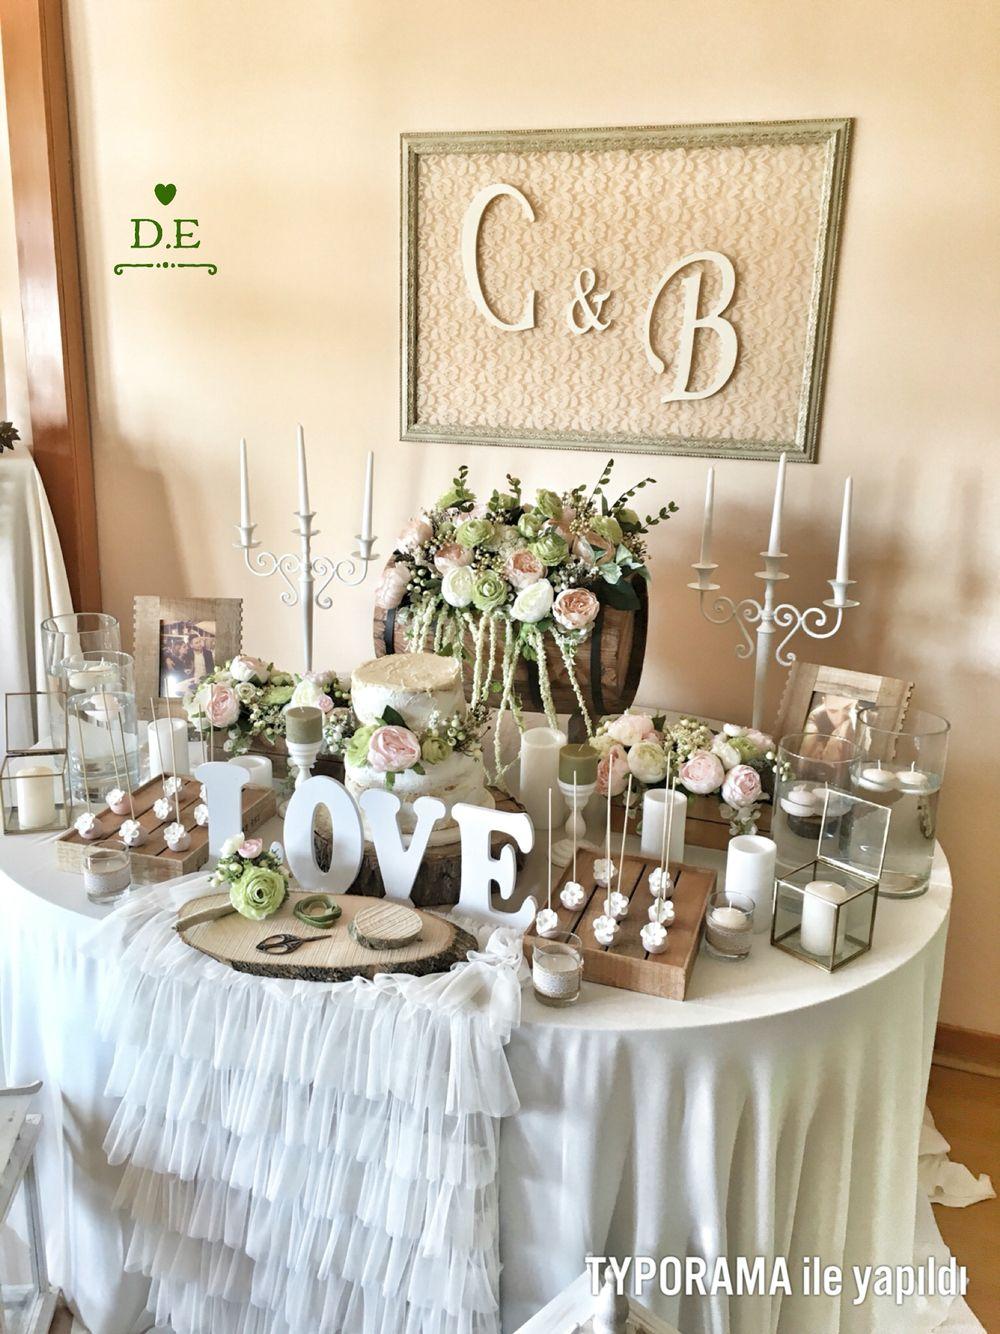 Engagement Table Wedding Dugun Masasi Gelin Partisi Dekorasyonlari Nisan